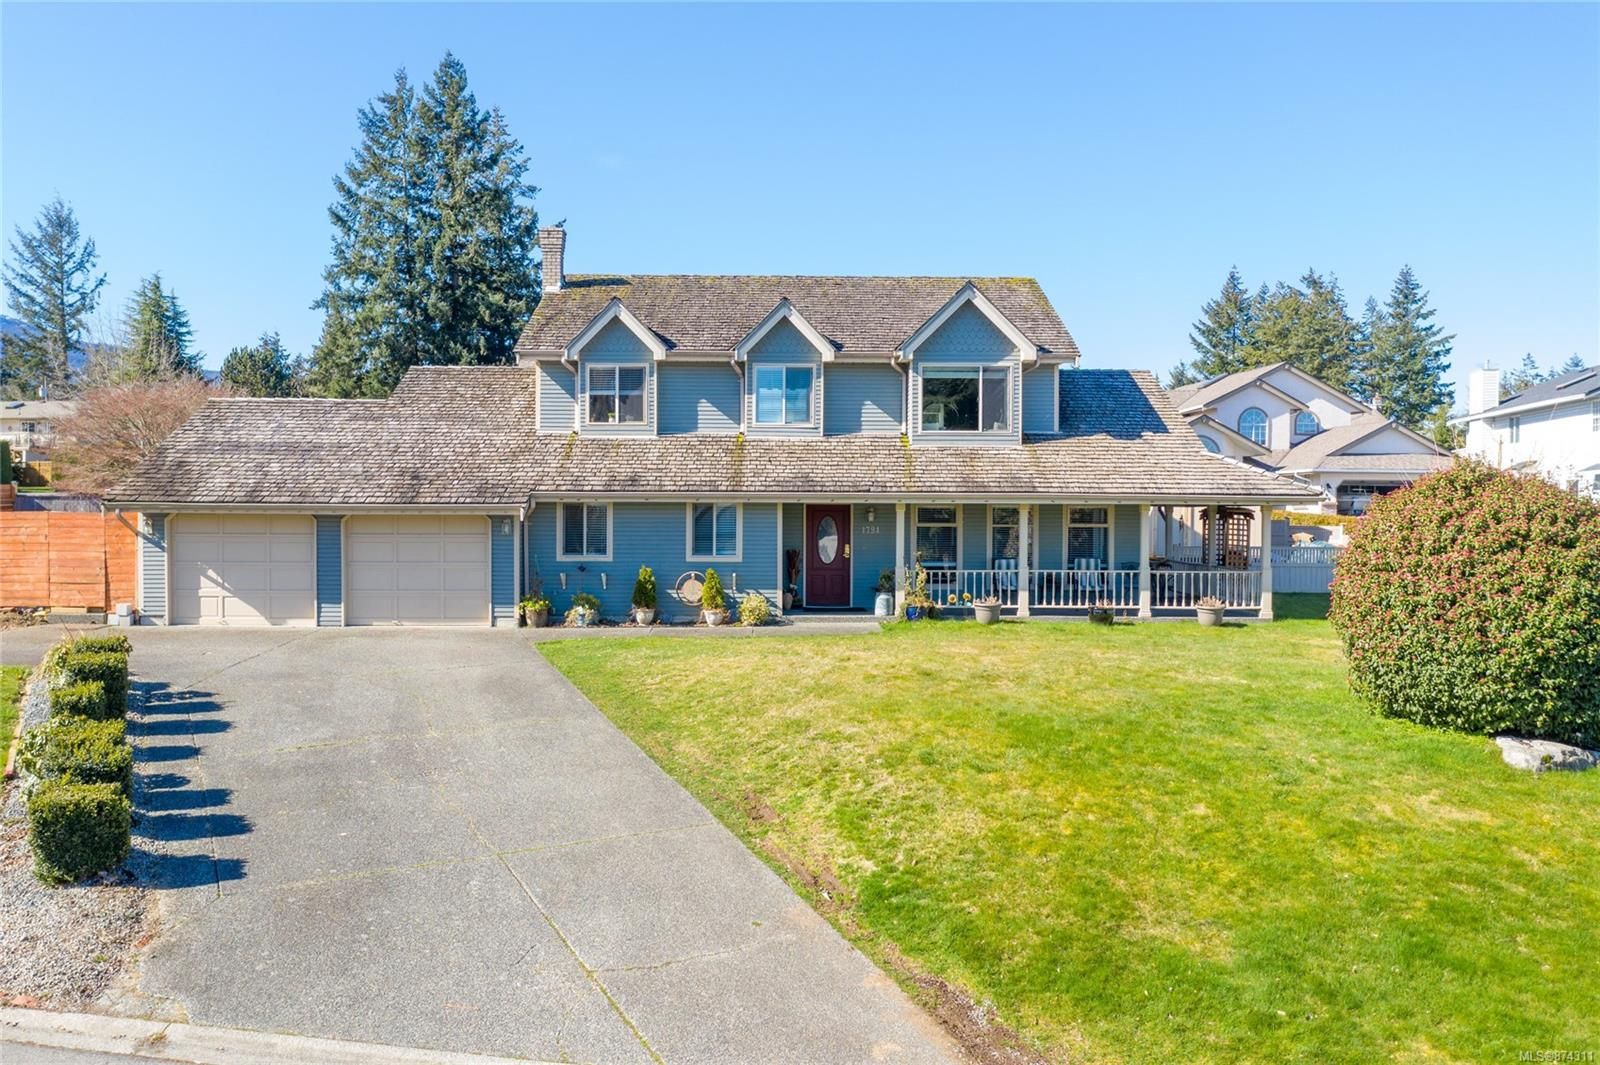 Main Photo: 1794 Latimer Rd in : Na Central Nanaimo House for sale (Nanaimo)  : MLS®# 874311